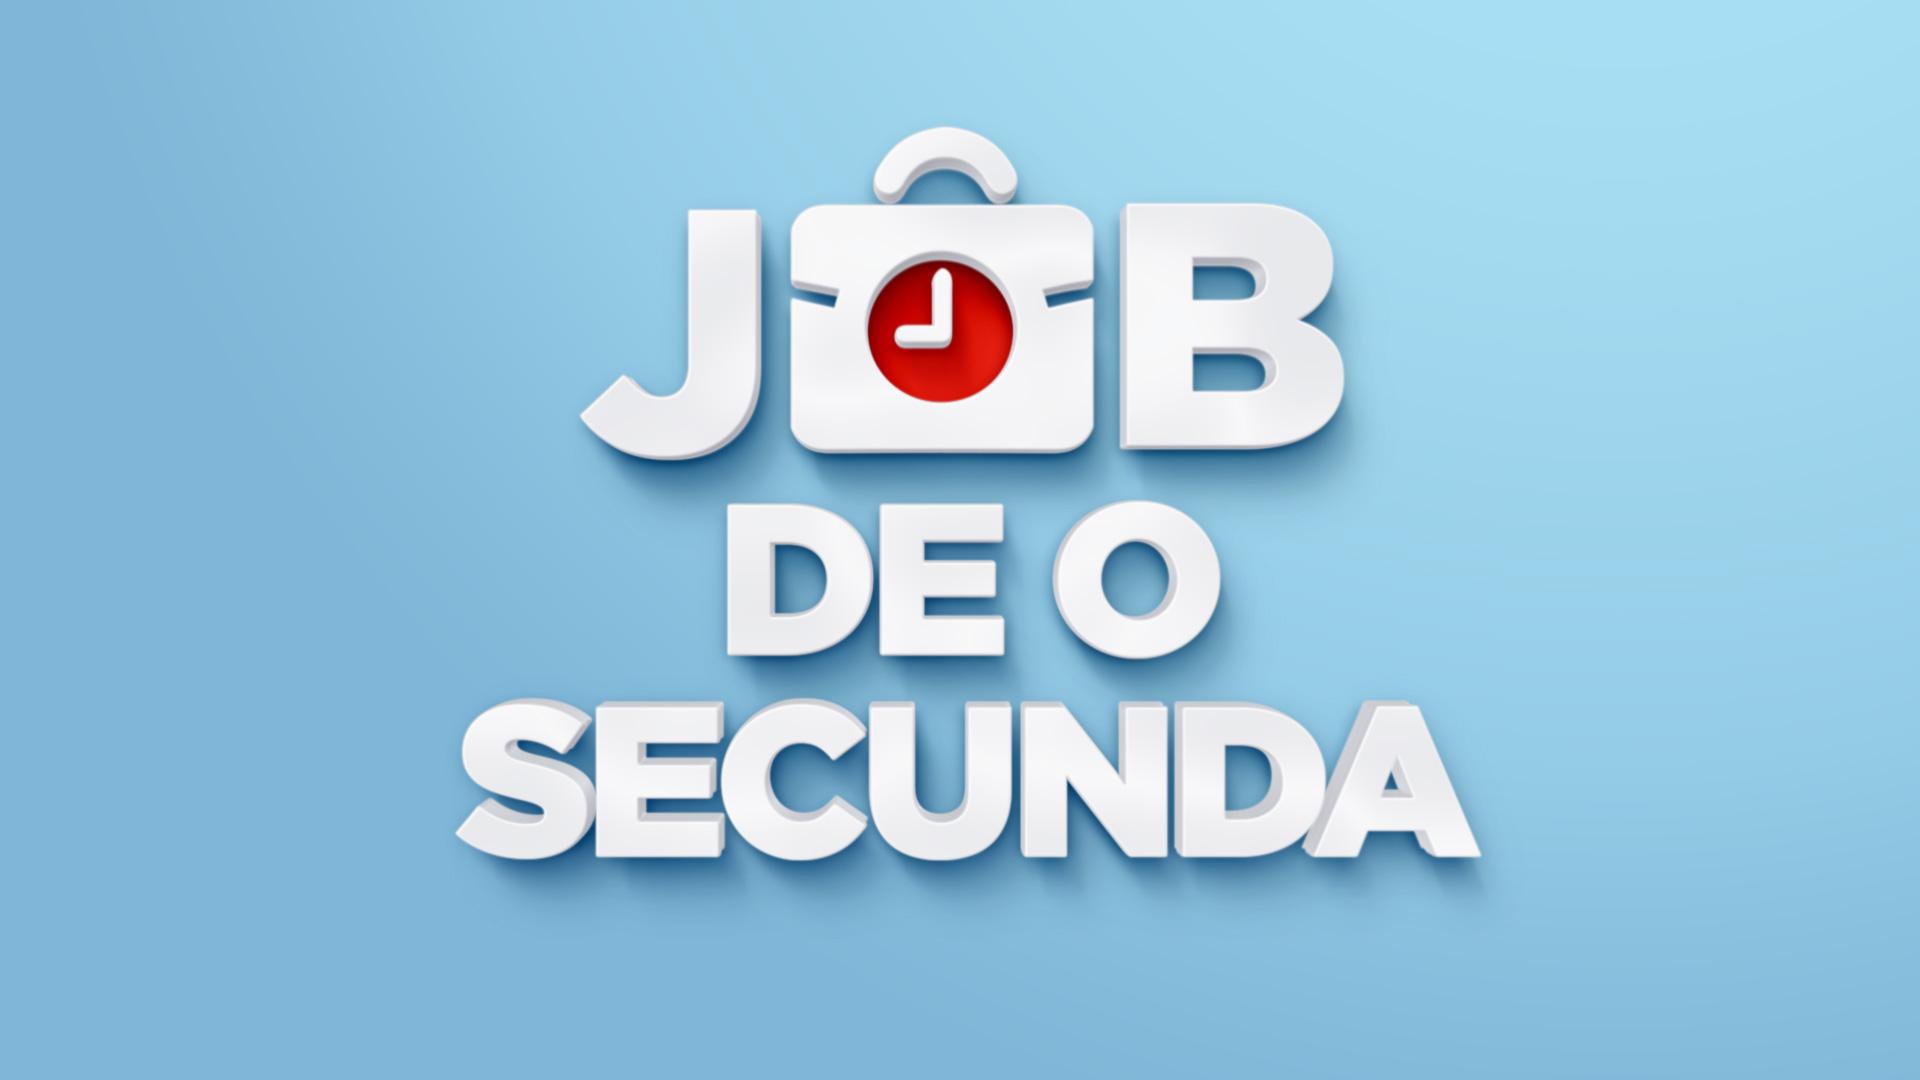 logo-3D-1.jpg